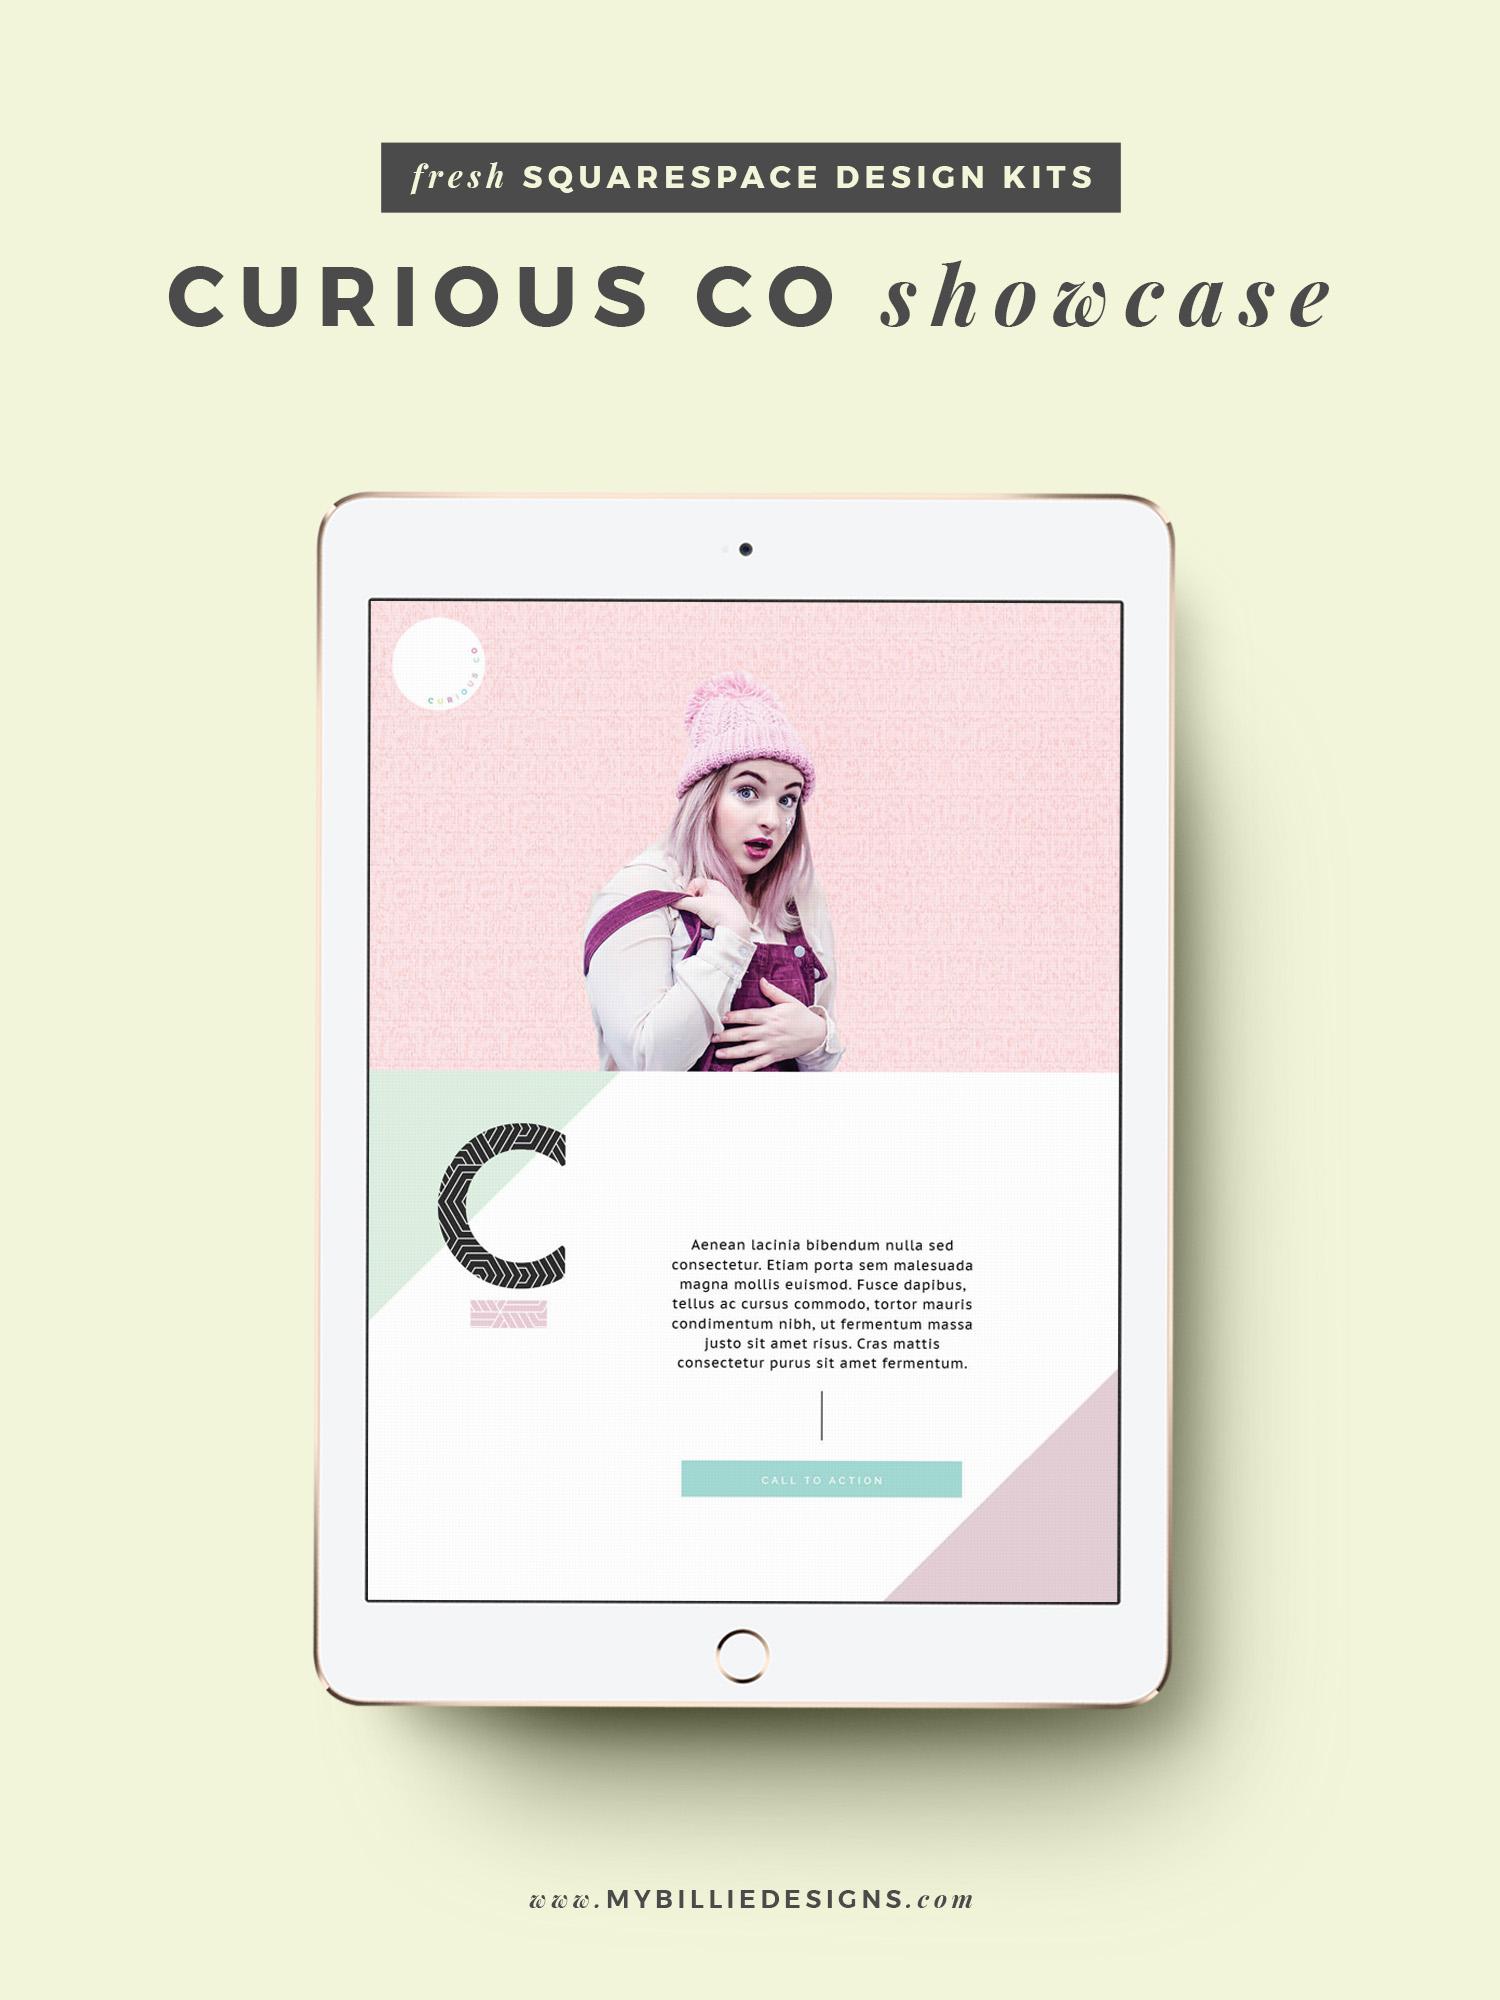 MBD Squarespace Design Kits | Curious Co Design + Customization Ideas